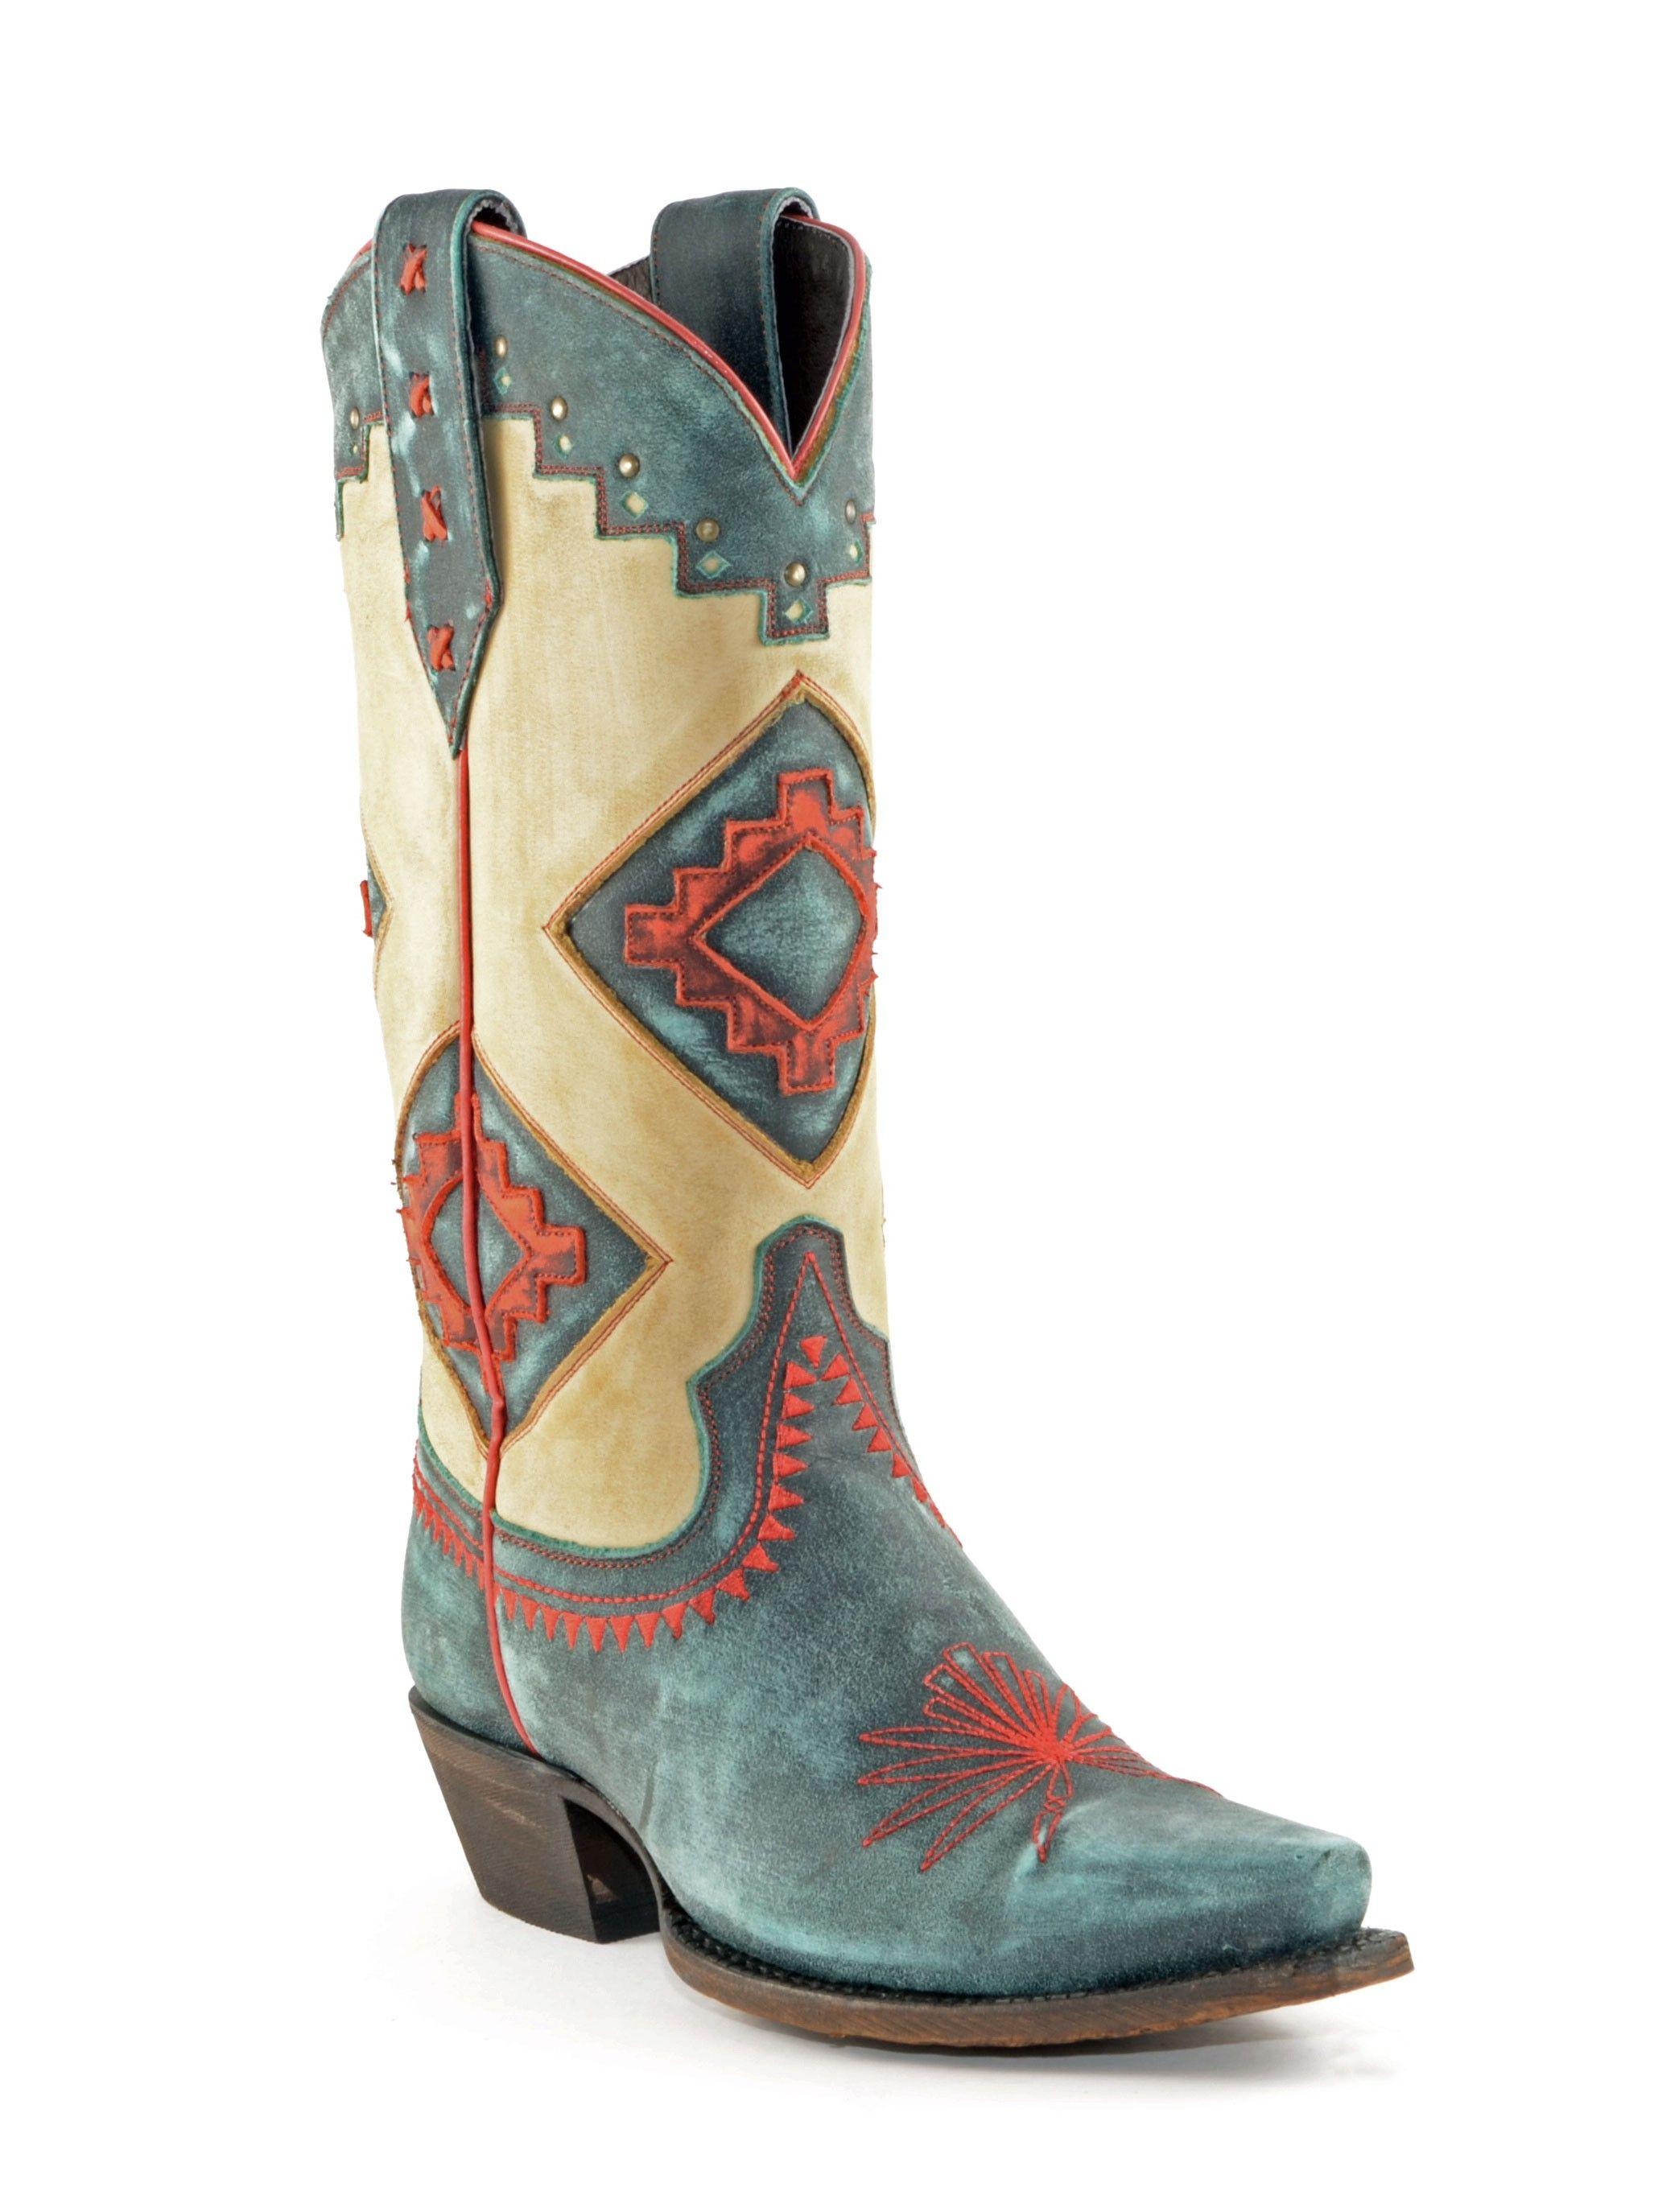 Women's Caborca Vintage Boots Turqueza #MAC090